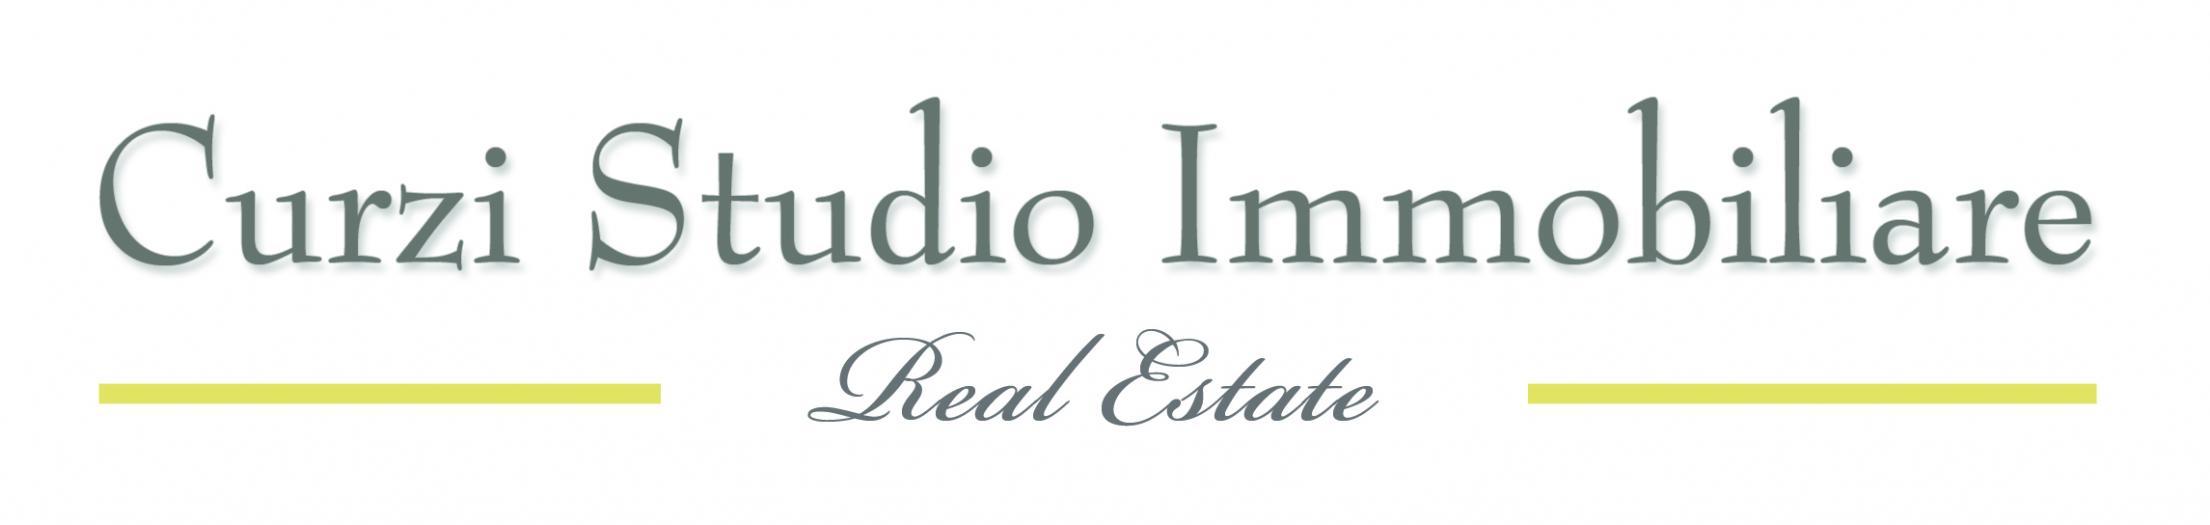 Curzi Studio Immobiliare